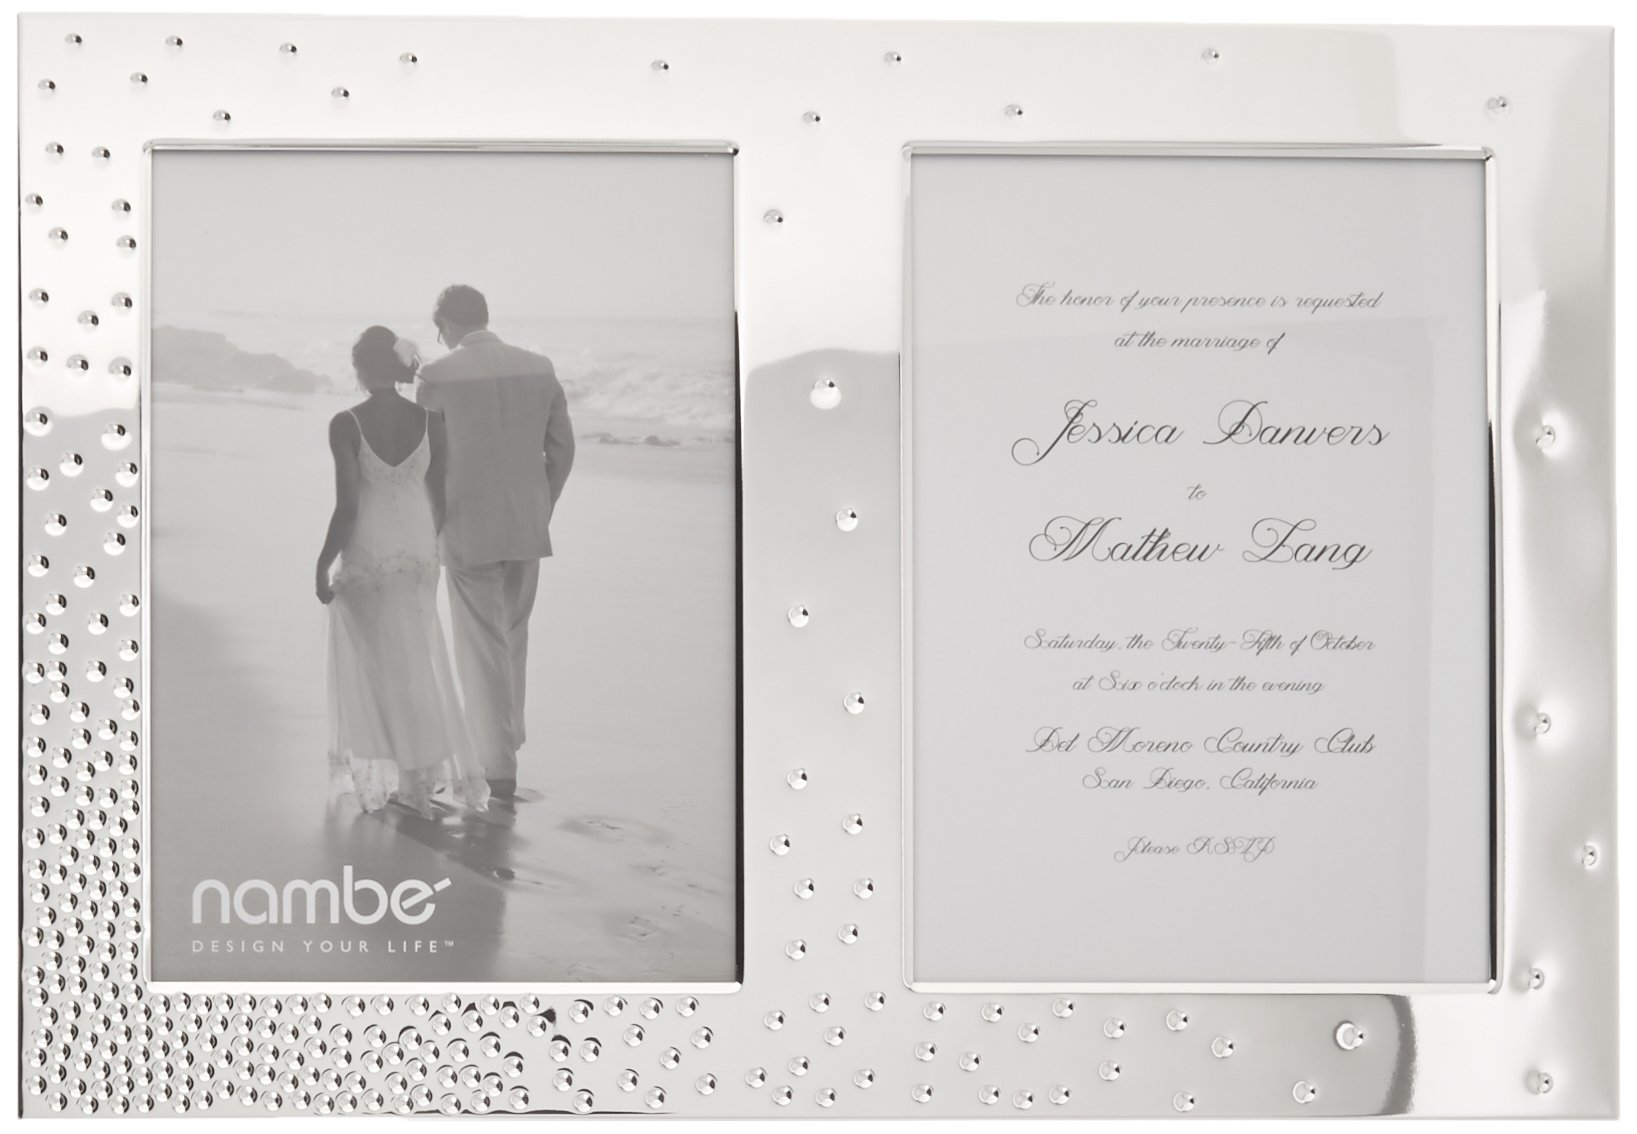 Nambé Dazzle Double Invitation Frame by Nambé